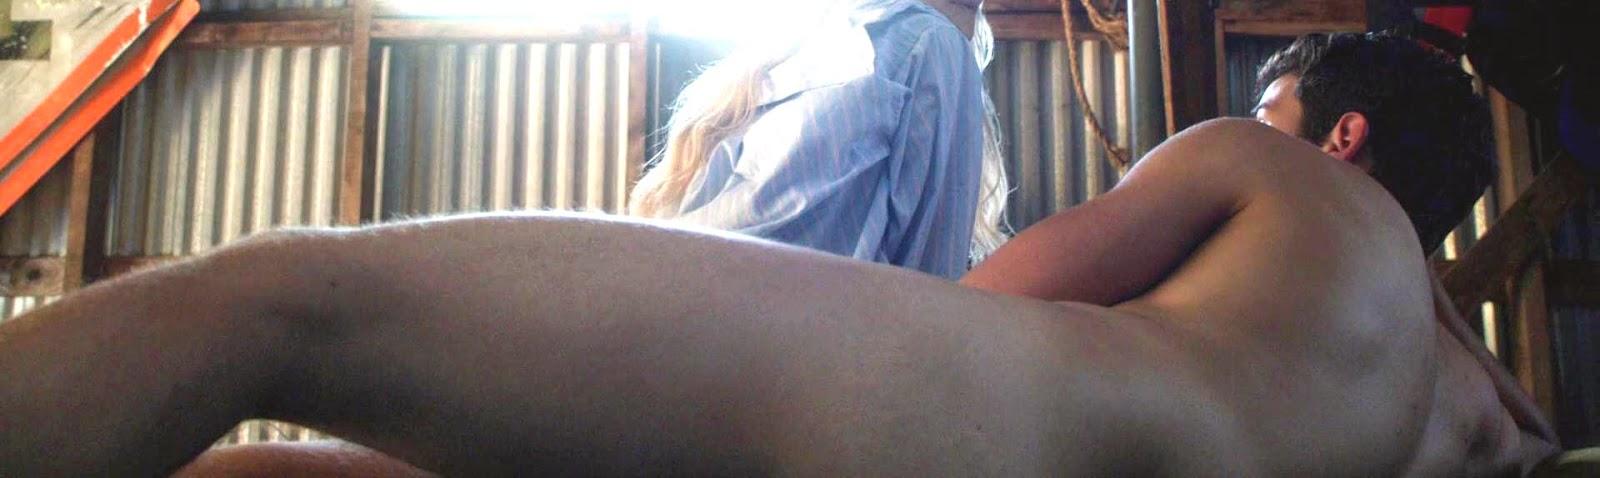 chubby girls in tight miniskirt